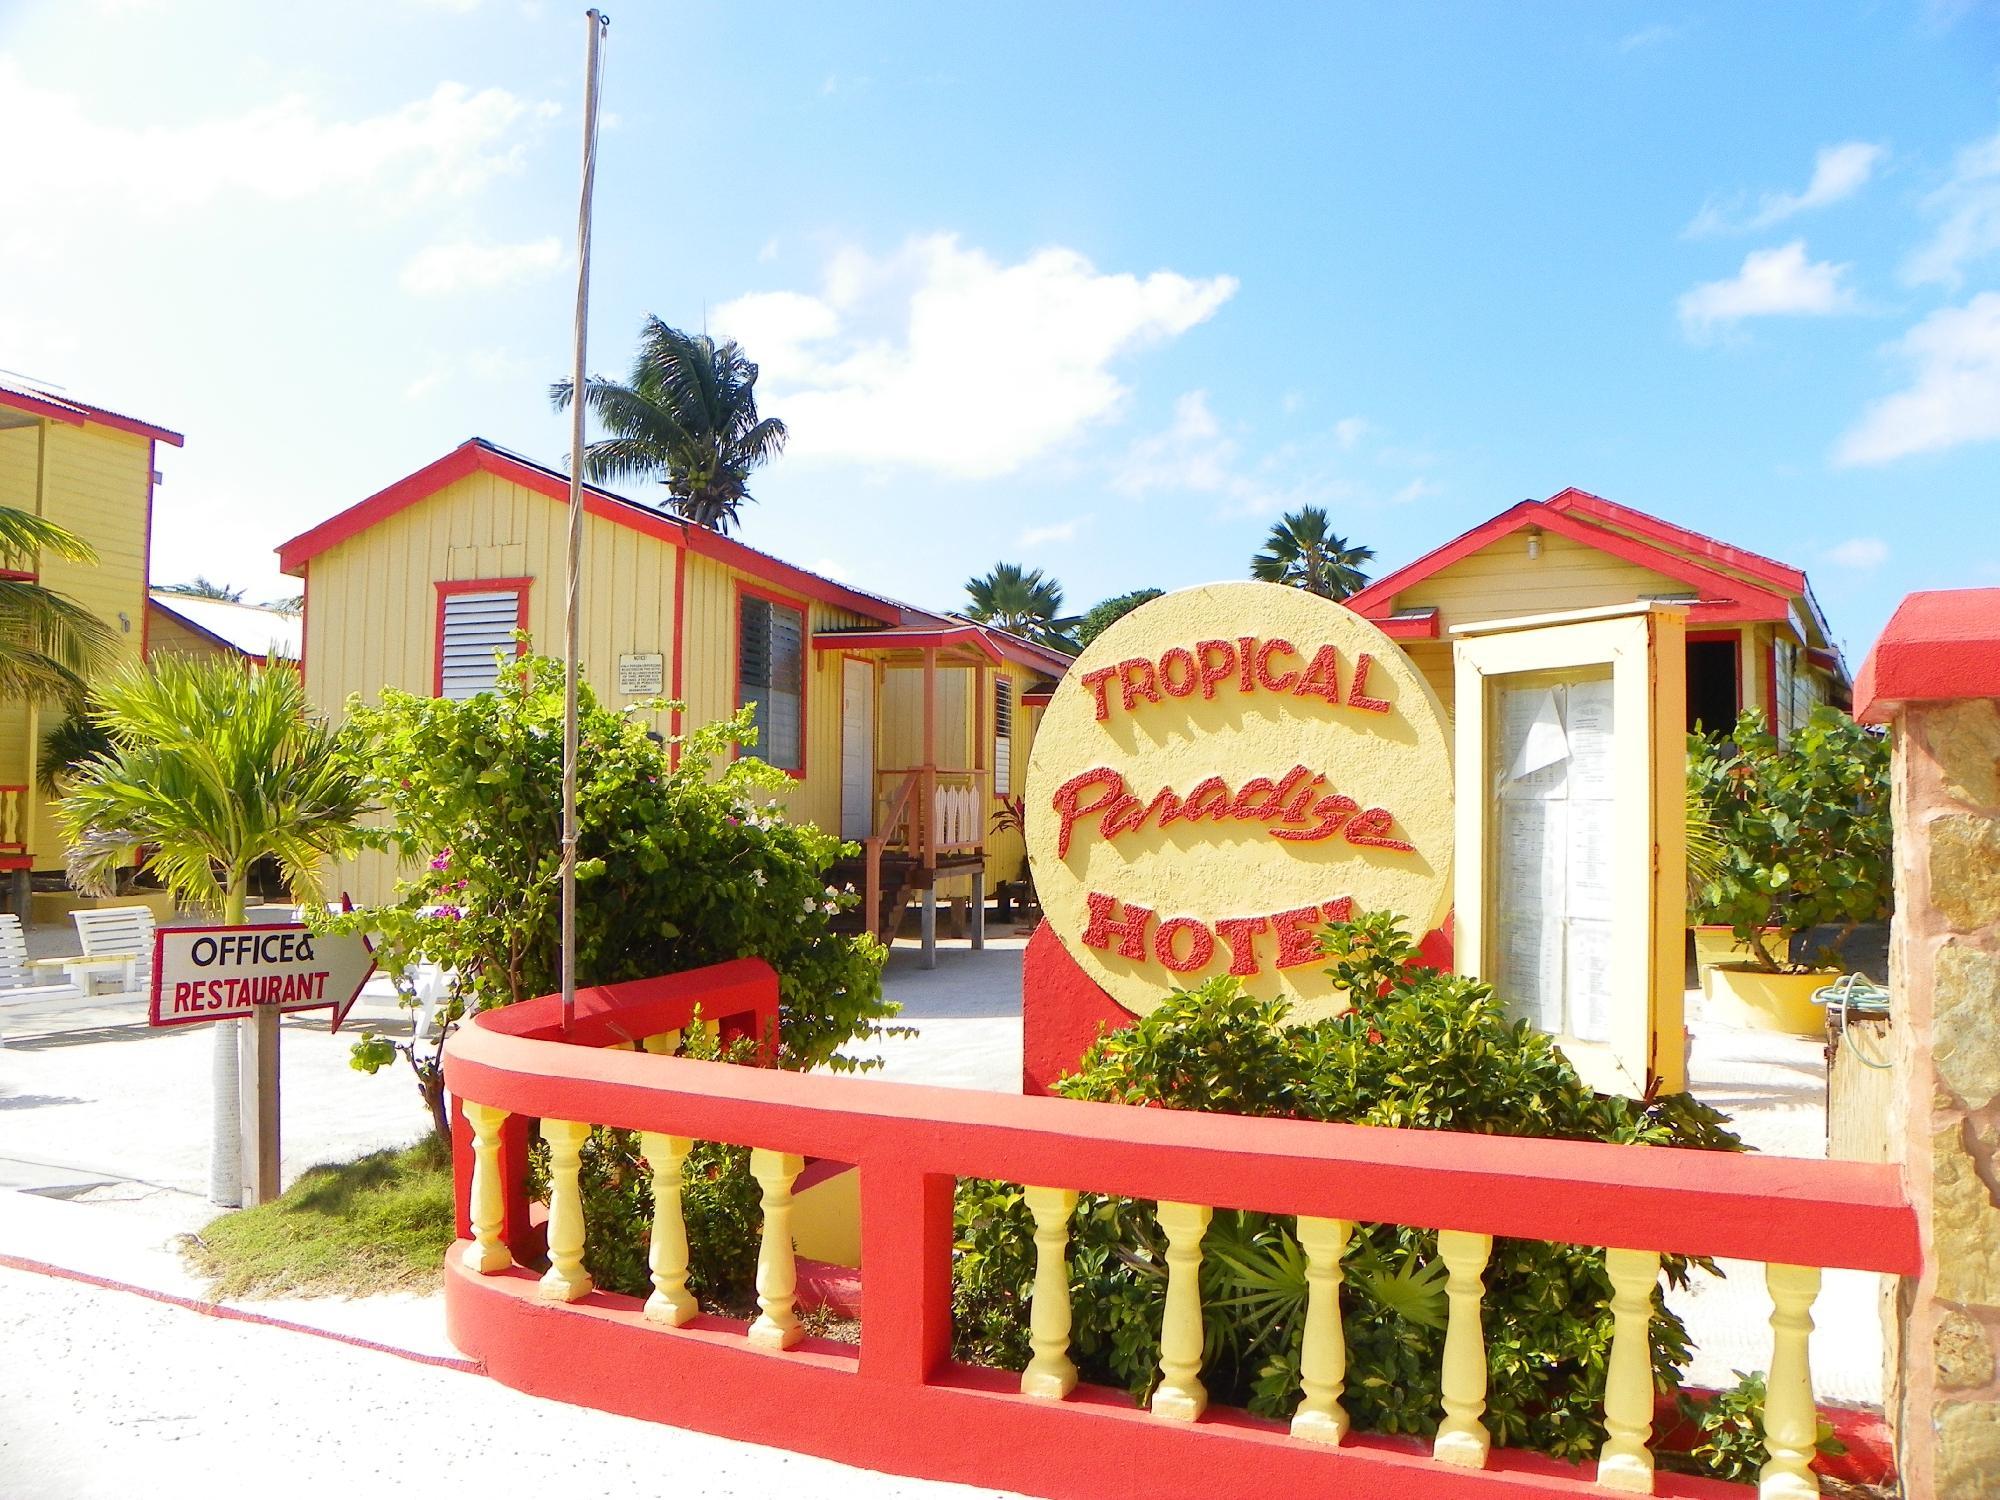 Tropical Paradise Hotel